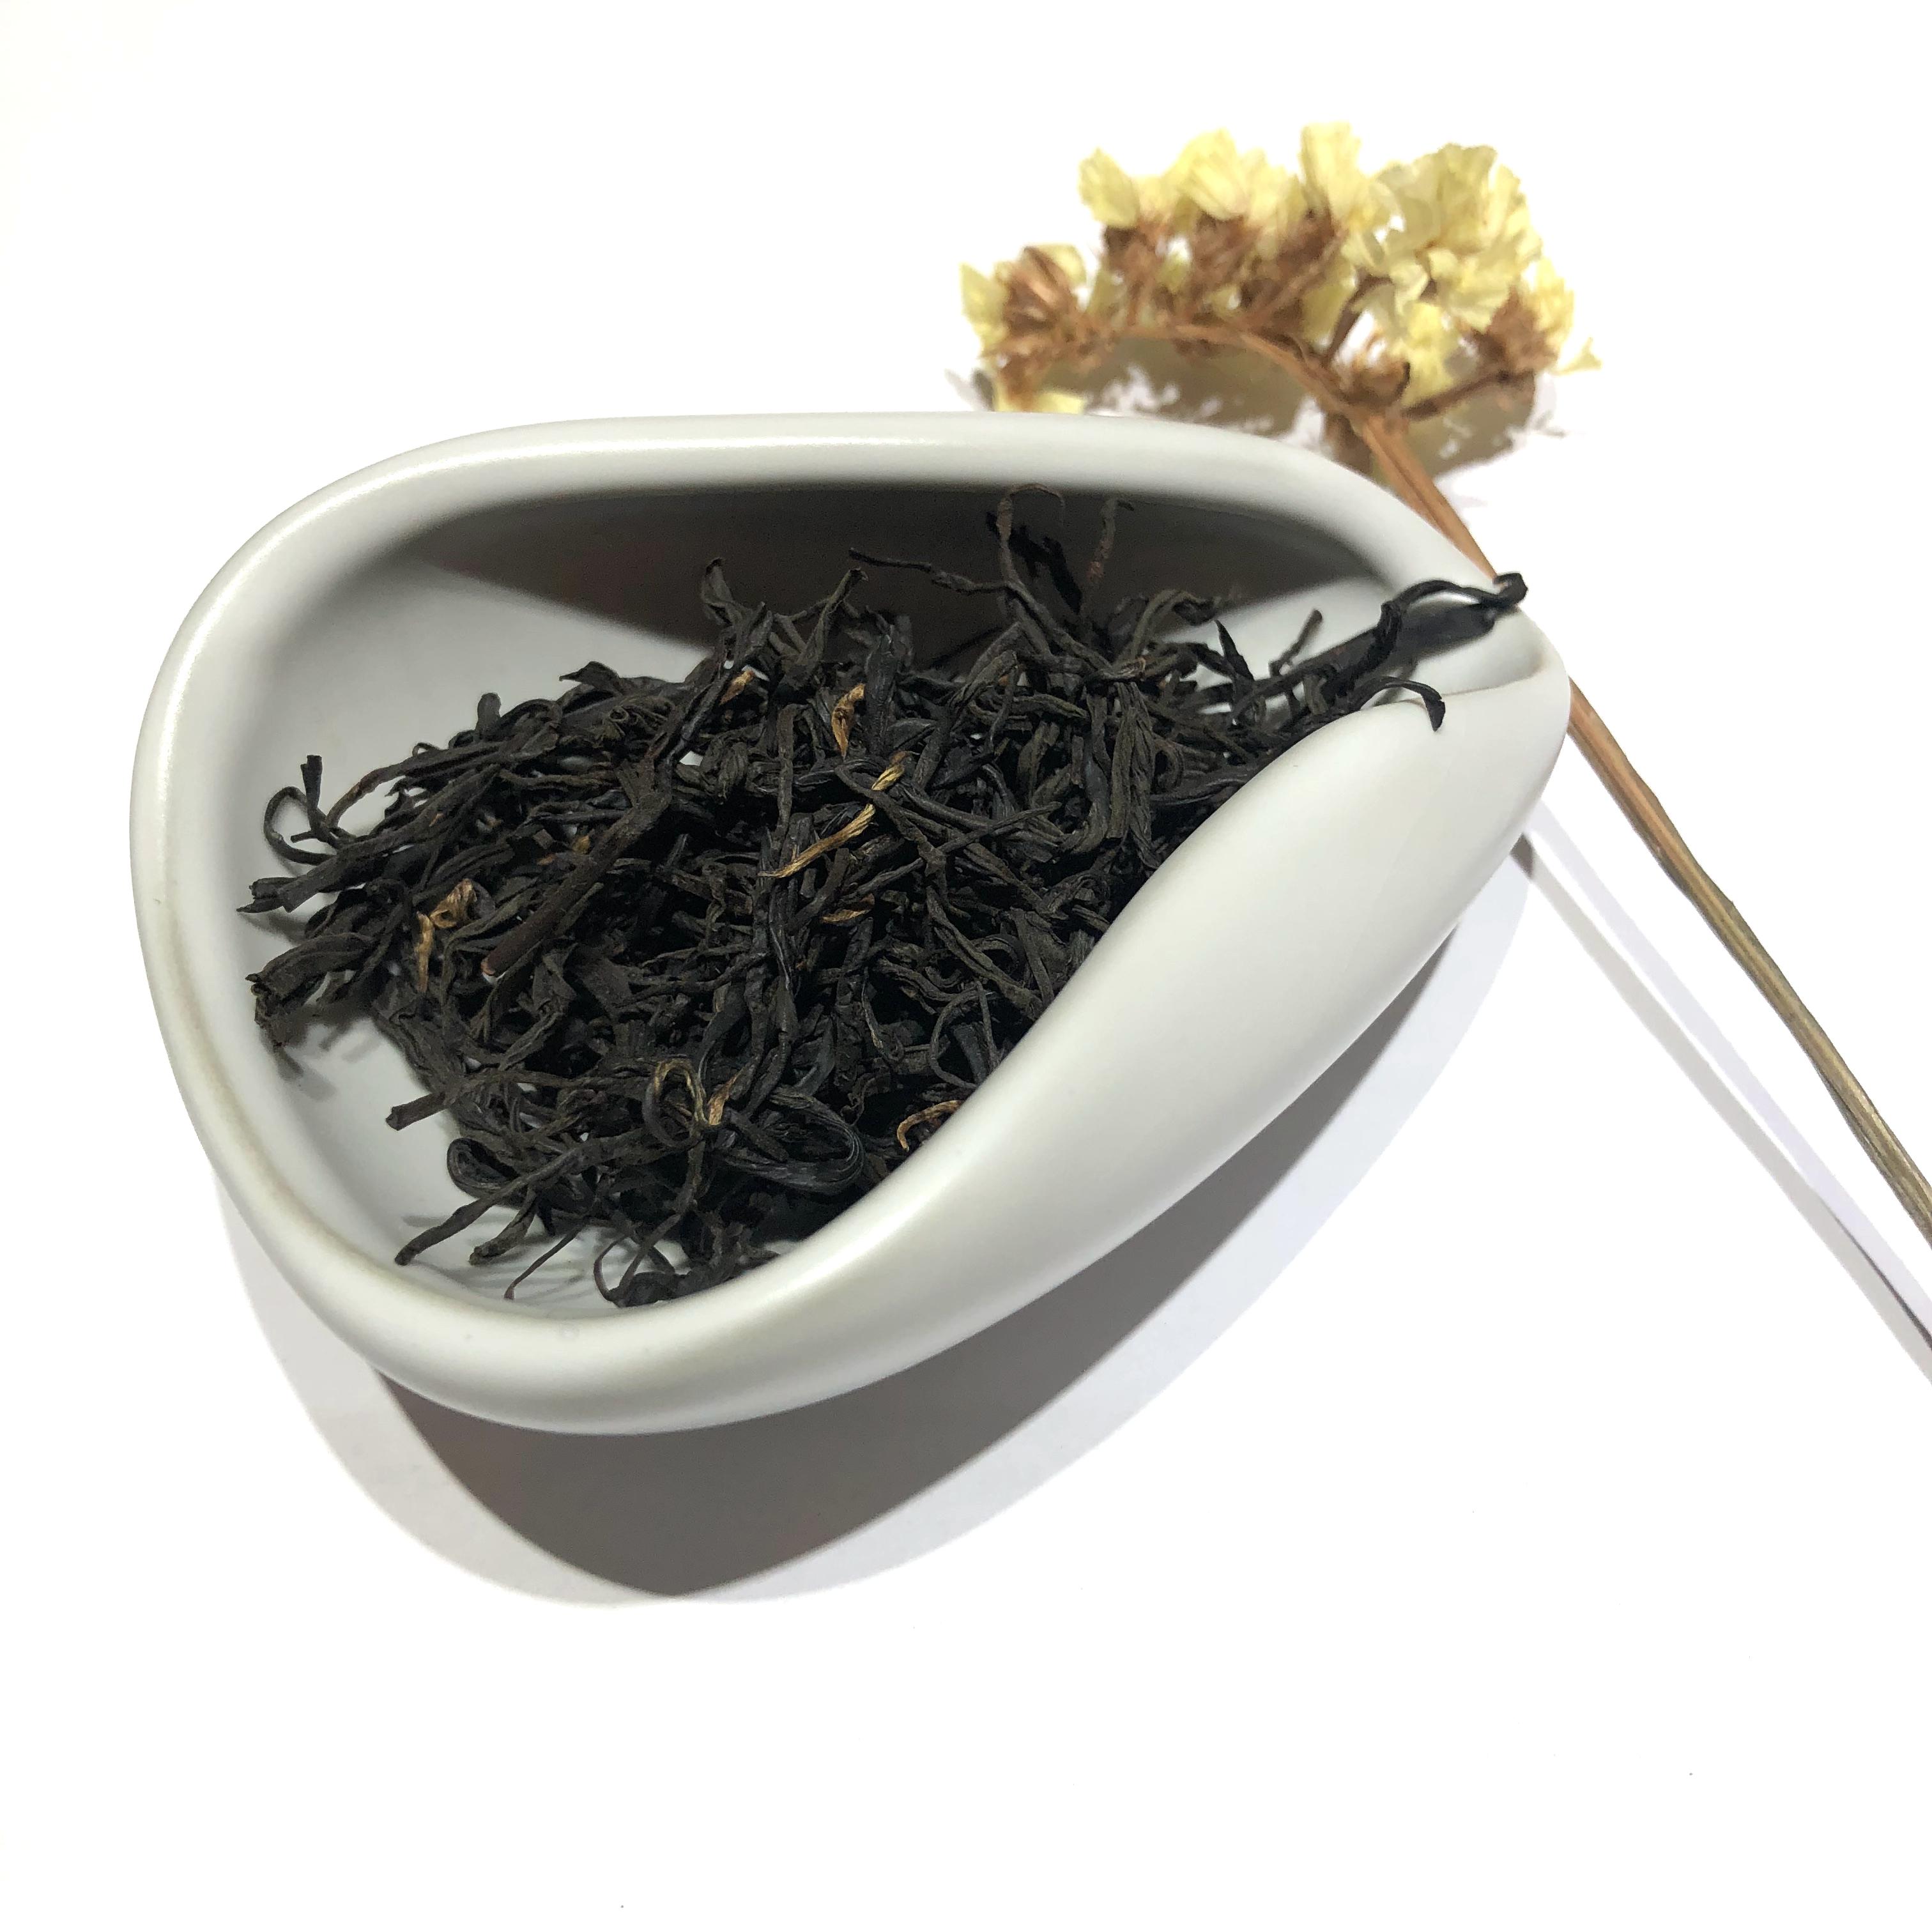 The Best Price Litchi Bagged Taiwan Black Tea - 4uTea   4uTea.com